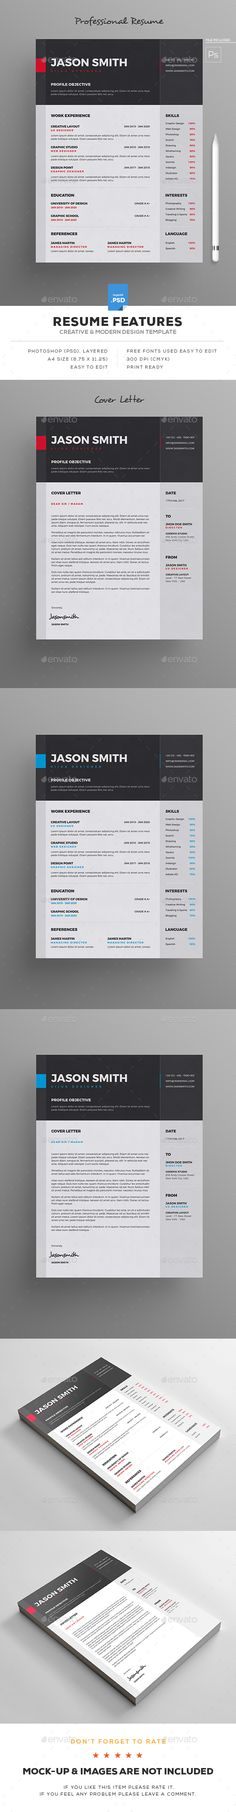 Simple Resume/CV Free Download   onbenet/1xfvKTt Resume/CV - resume download